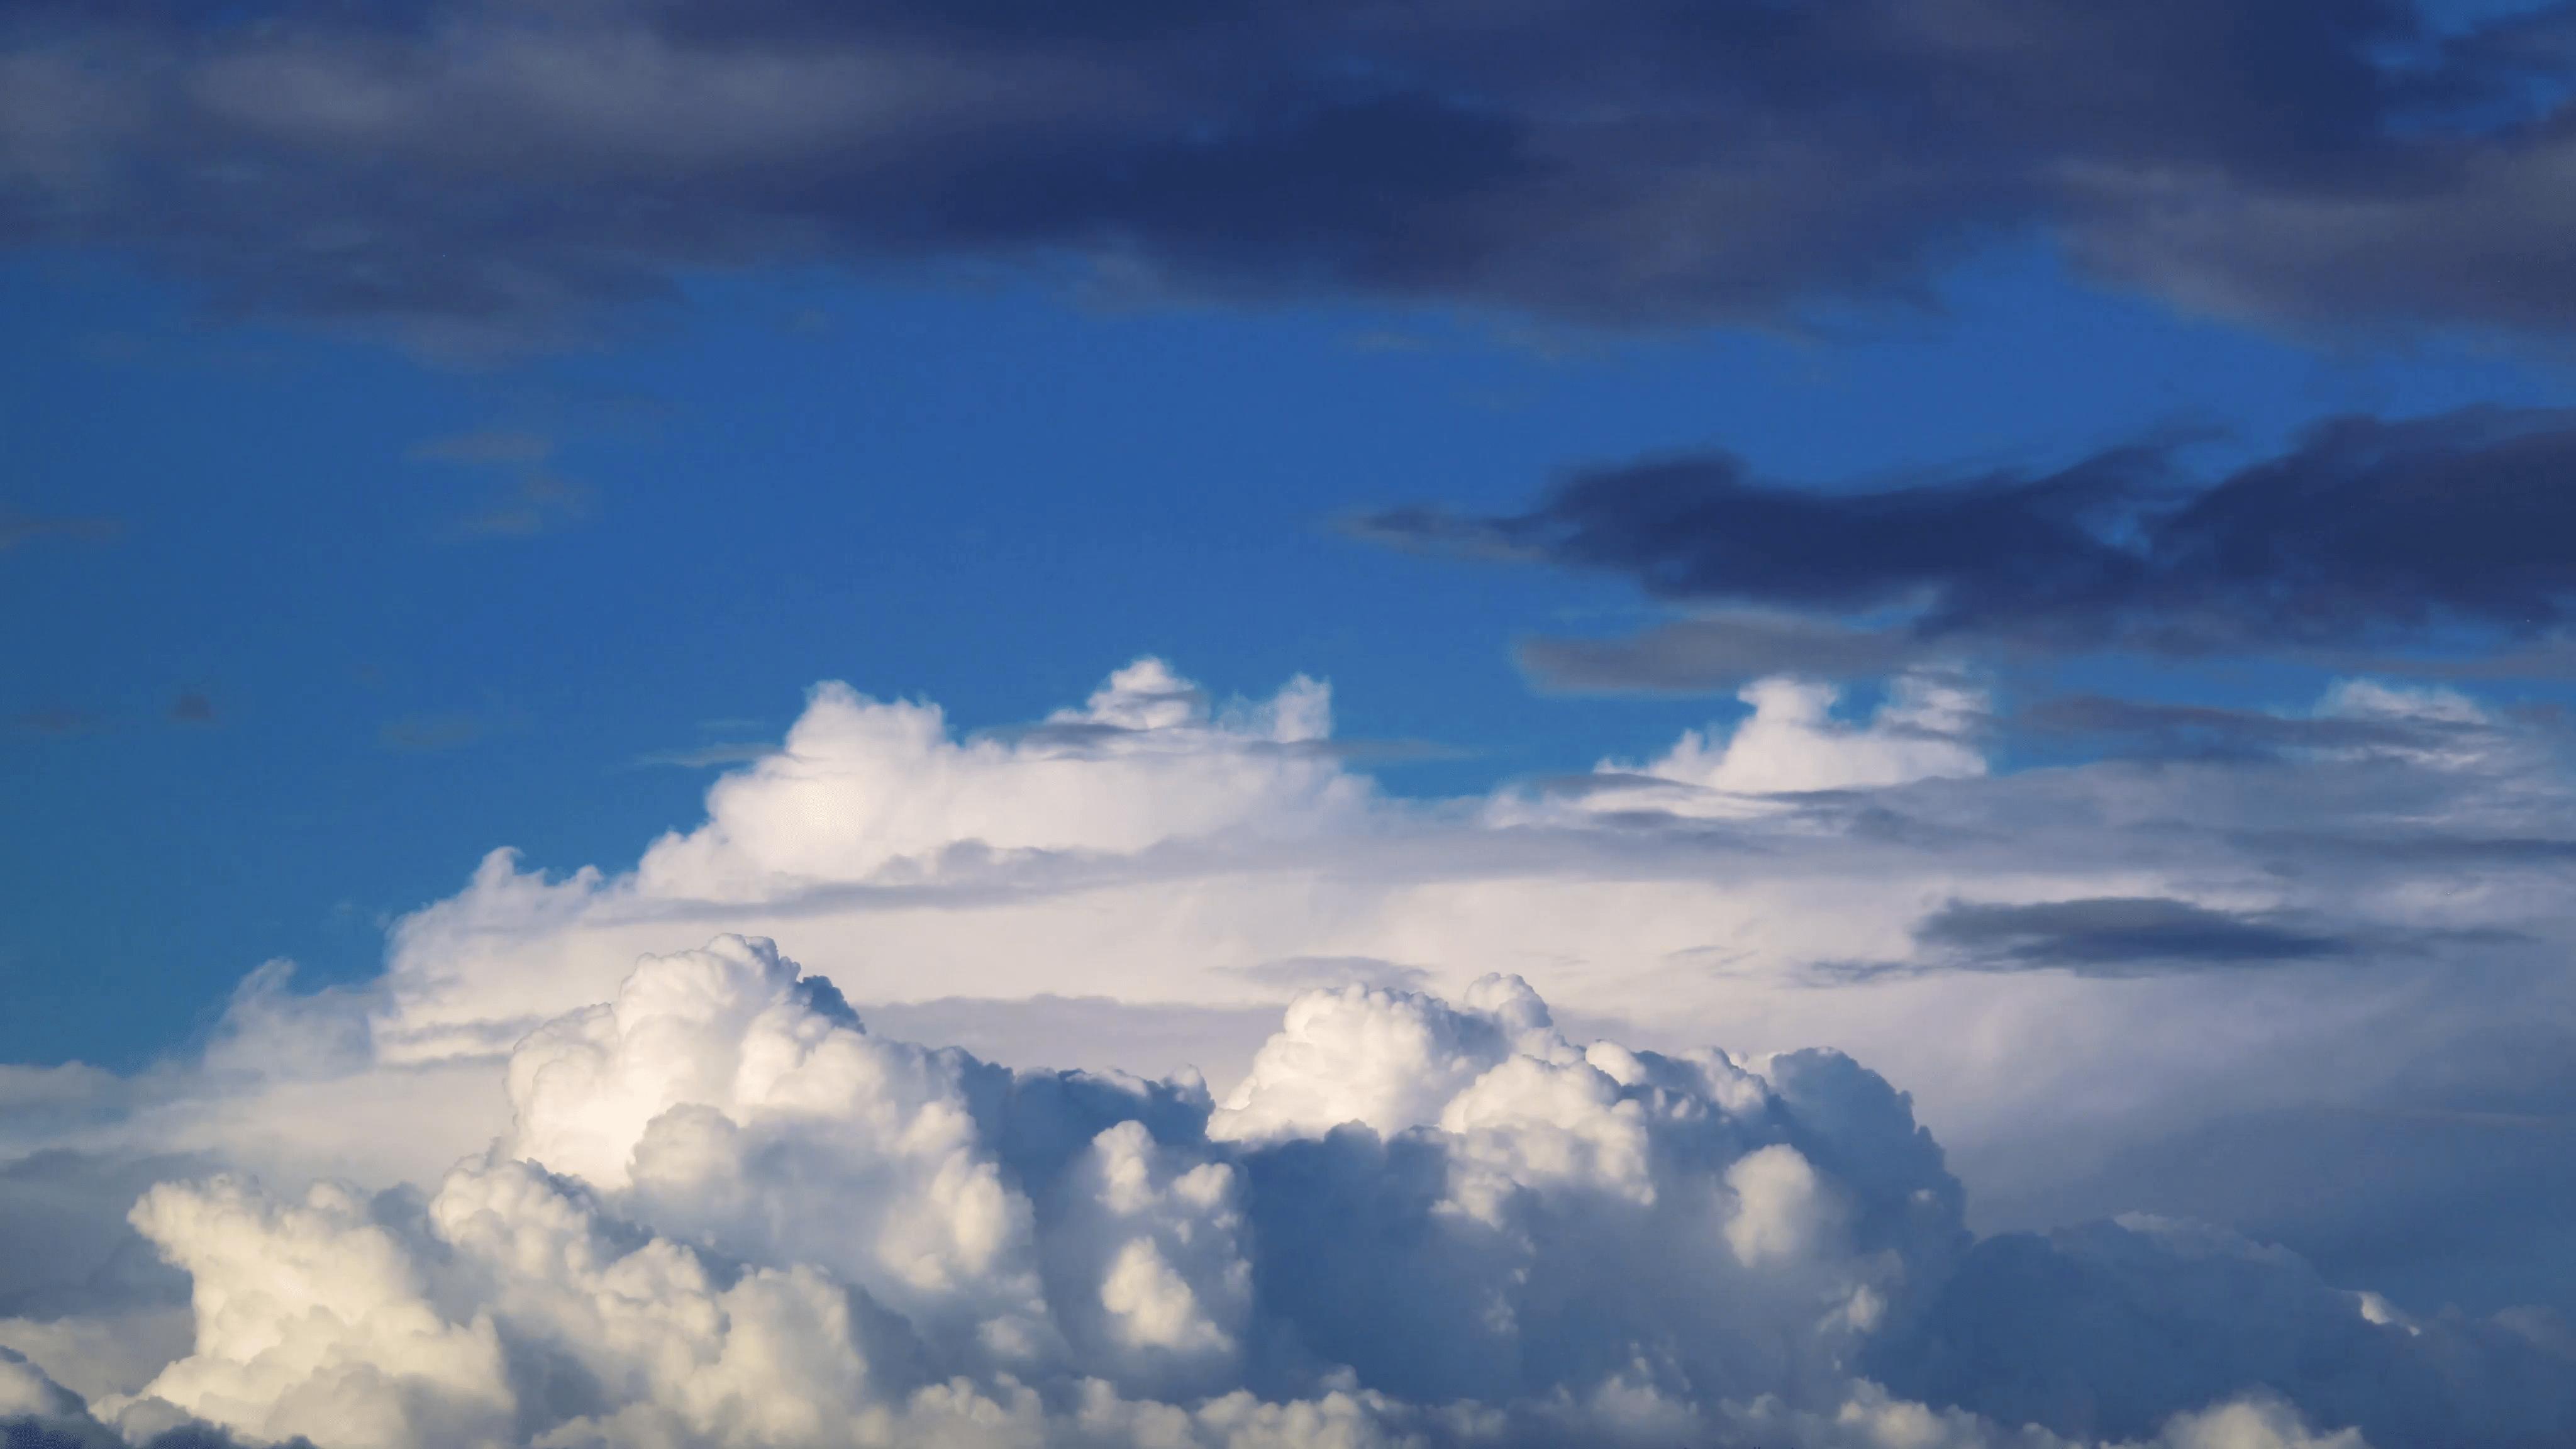 3d Animated Christmas Wallpapers Download Free Cloudy Sky Hd Wallpaper Pixelstalk Net